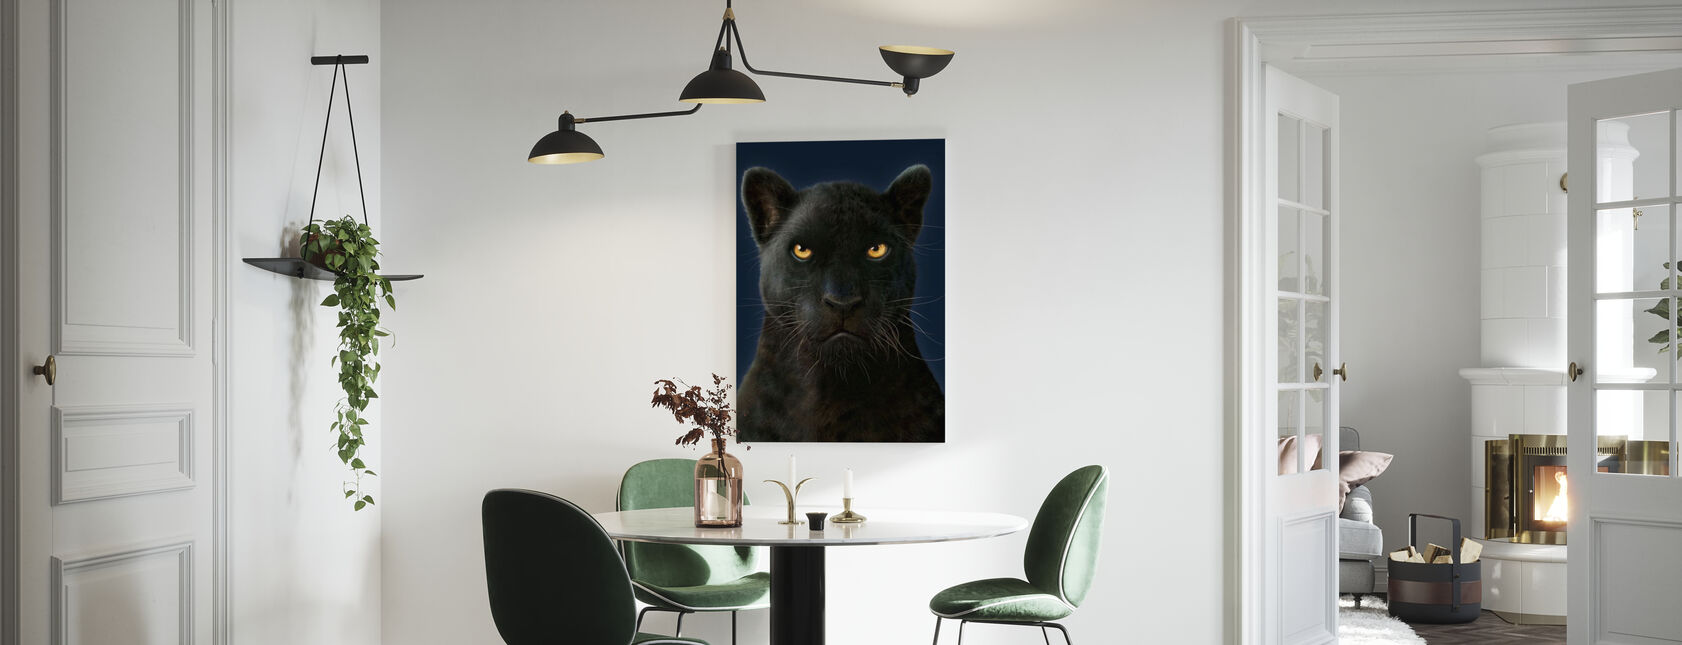 Zwarte Panter Portret - Canvas print - Keuken